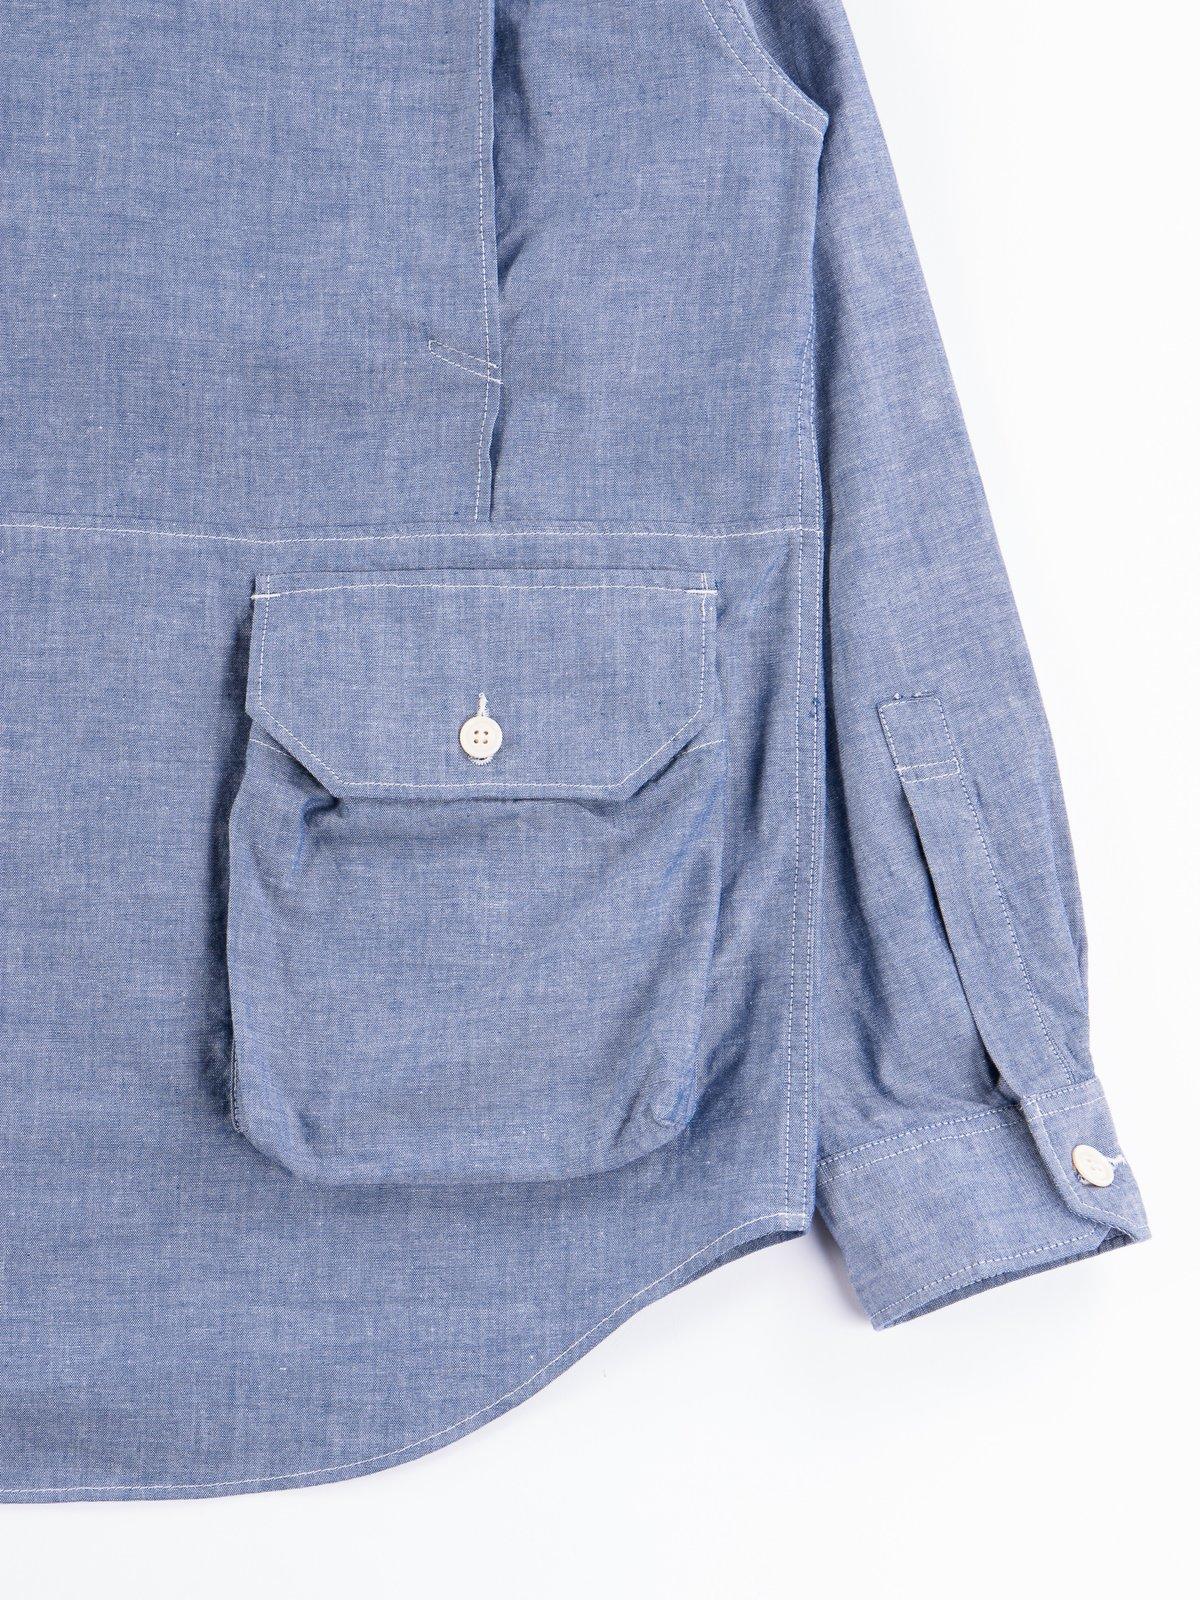 Blue Cotton Chambray Explorer Shirt Jacket - Image 8